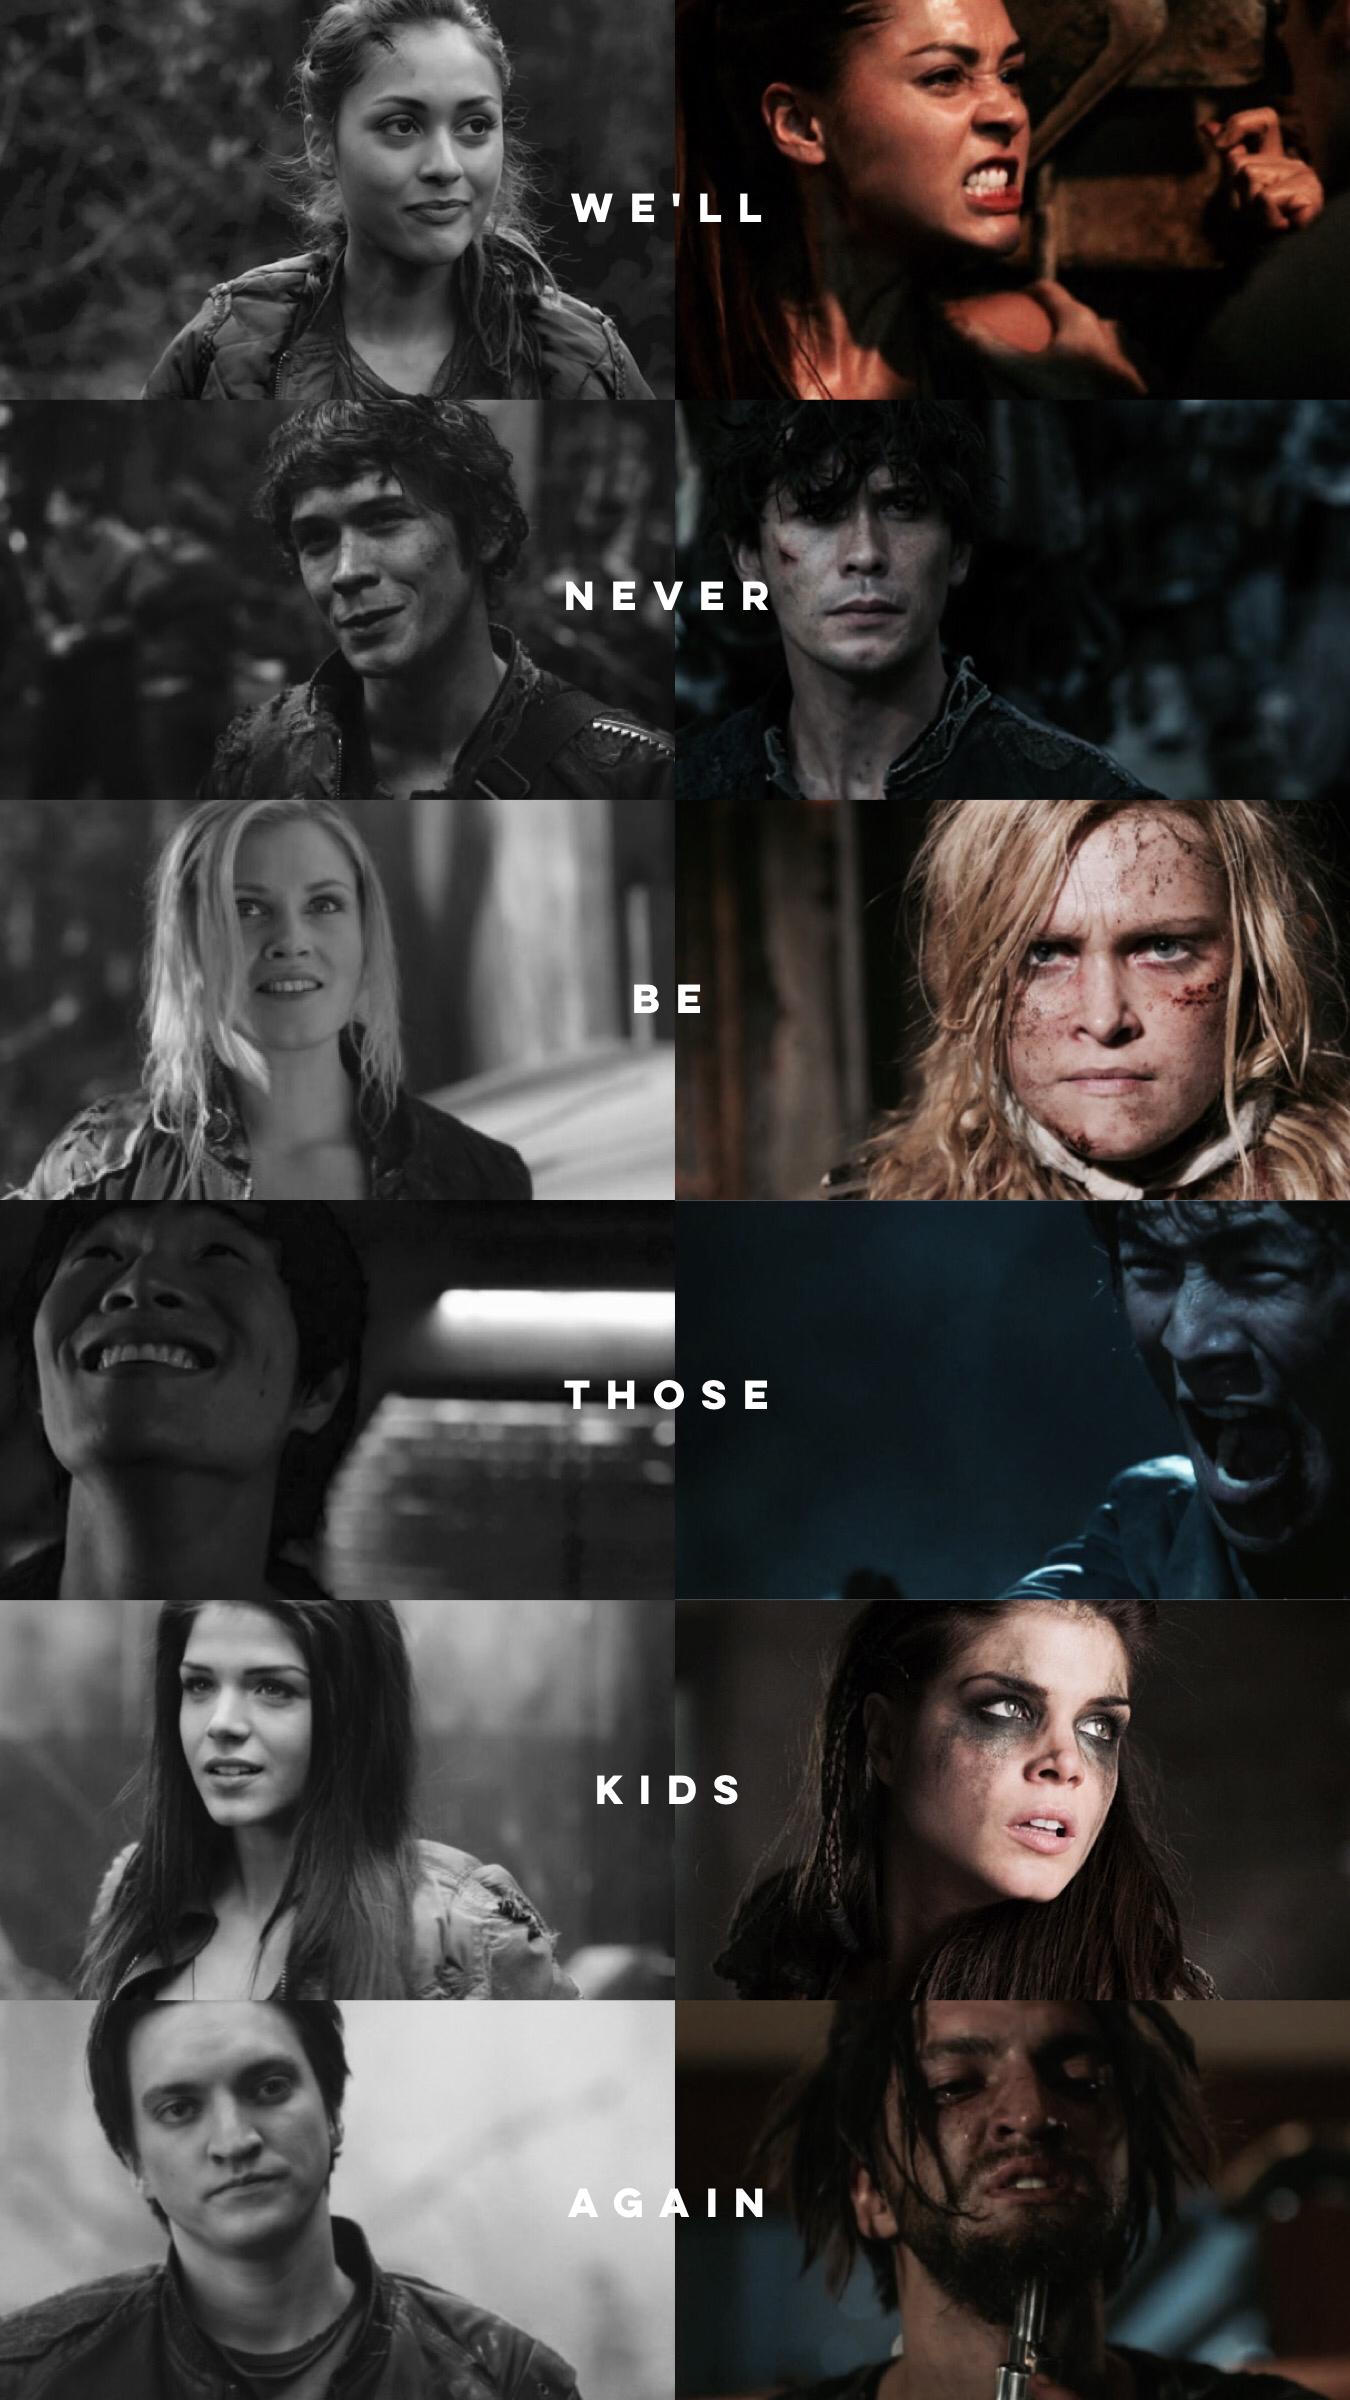 We Ll Never Be Those Kids Again The 100 The 100 Netflix Filmes E Series Series E Filmes